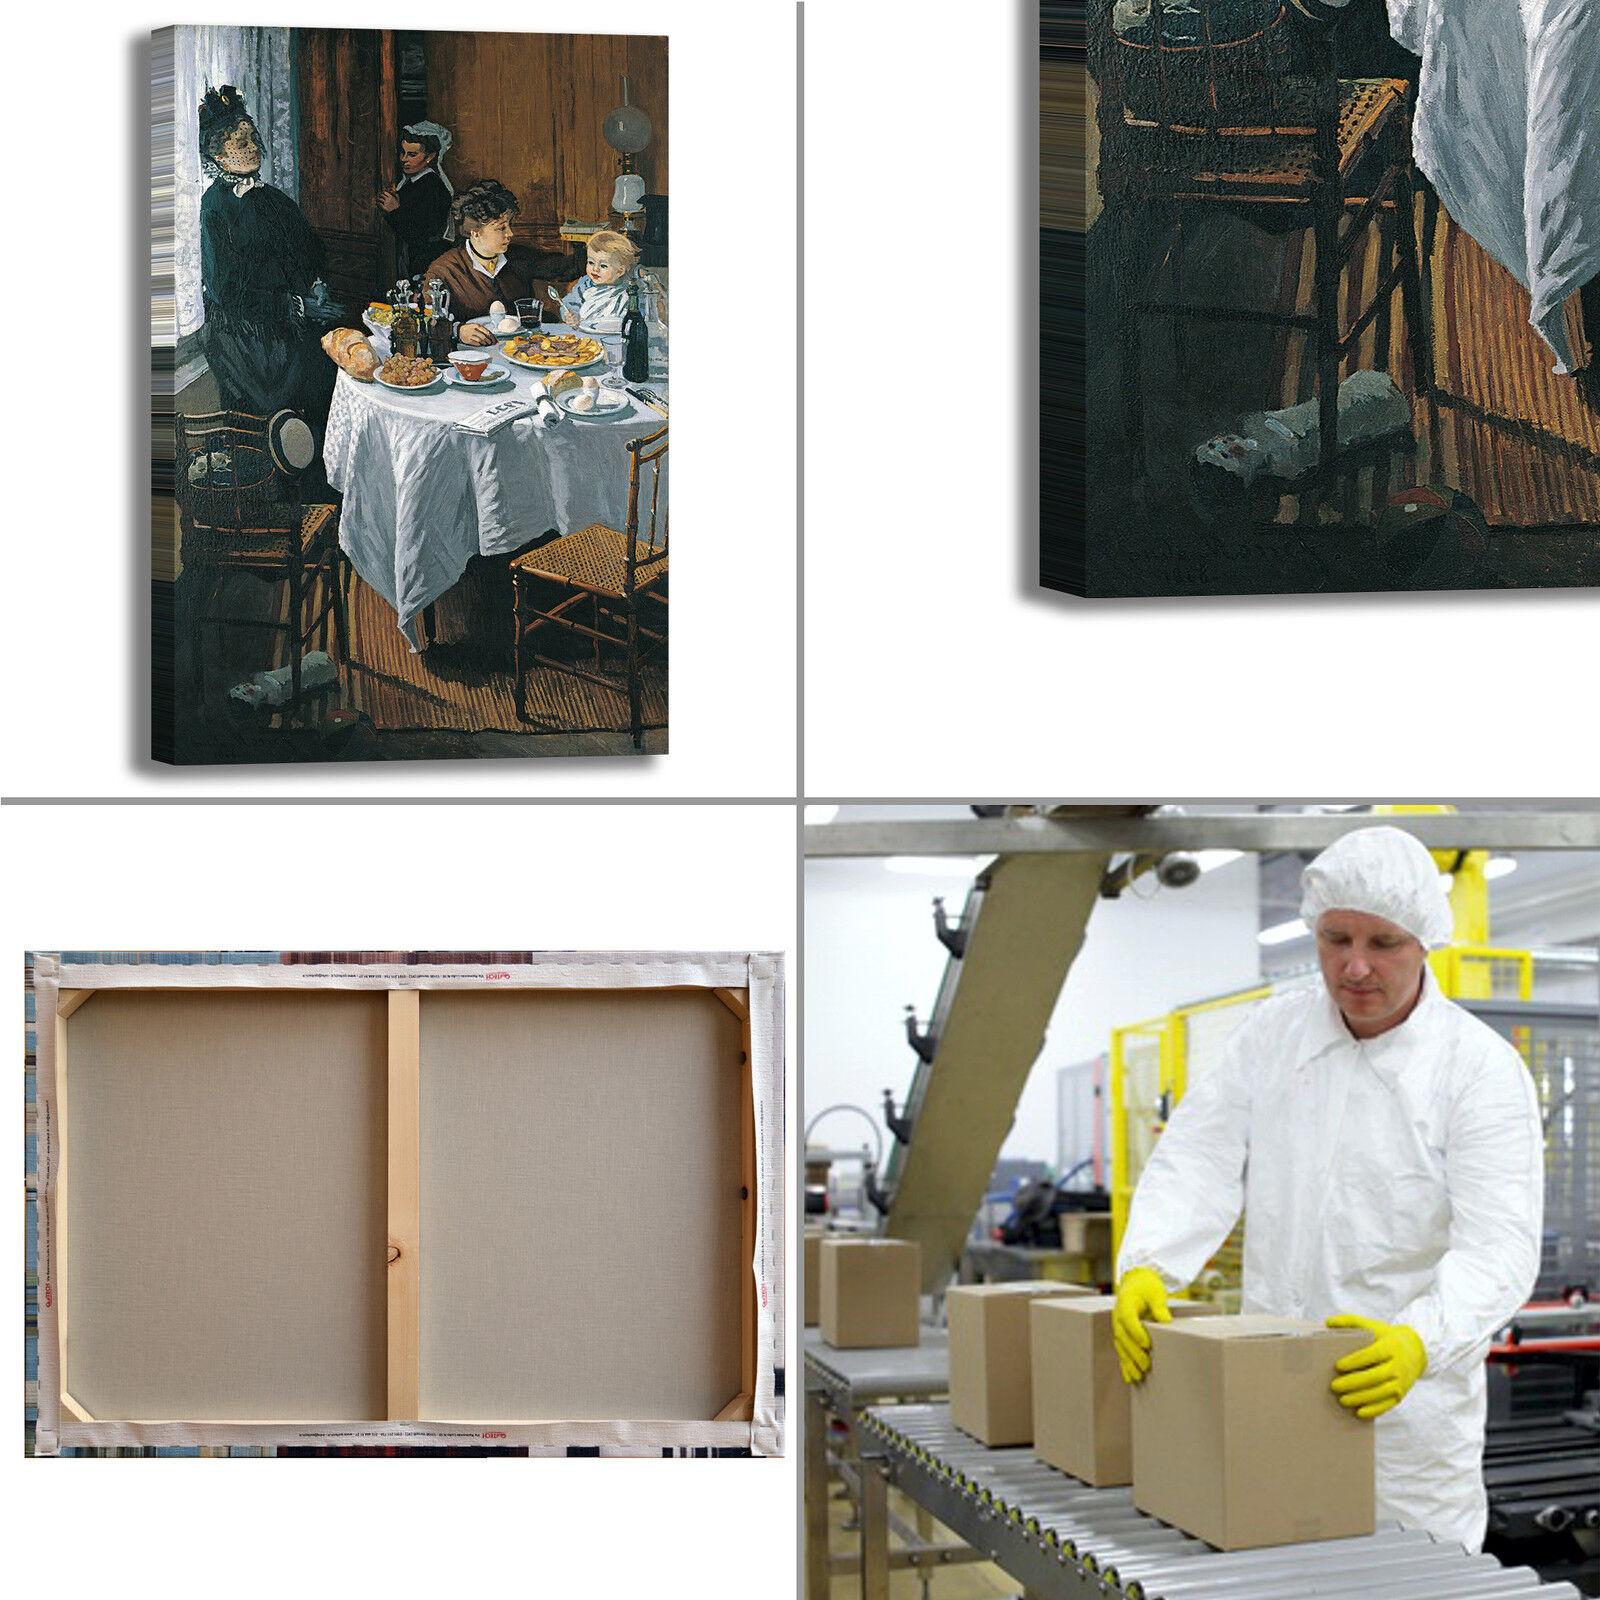 Monet il pranzo design quadro quadro design stampa tela dipinto telaio arRouge o casa c1b40b